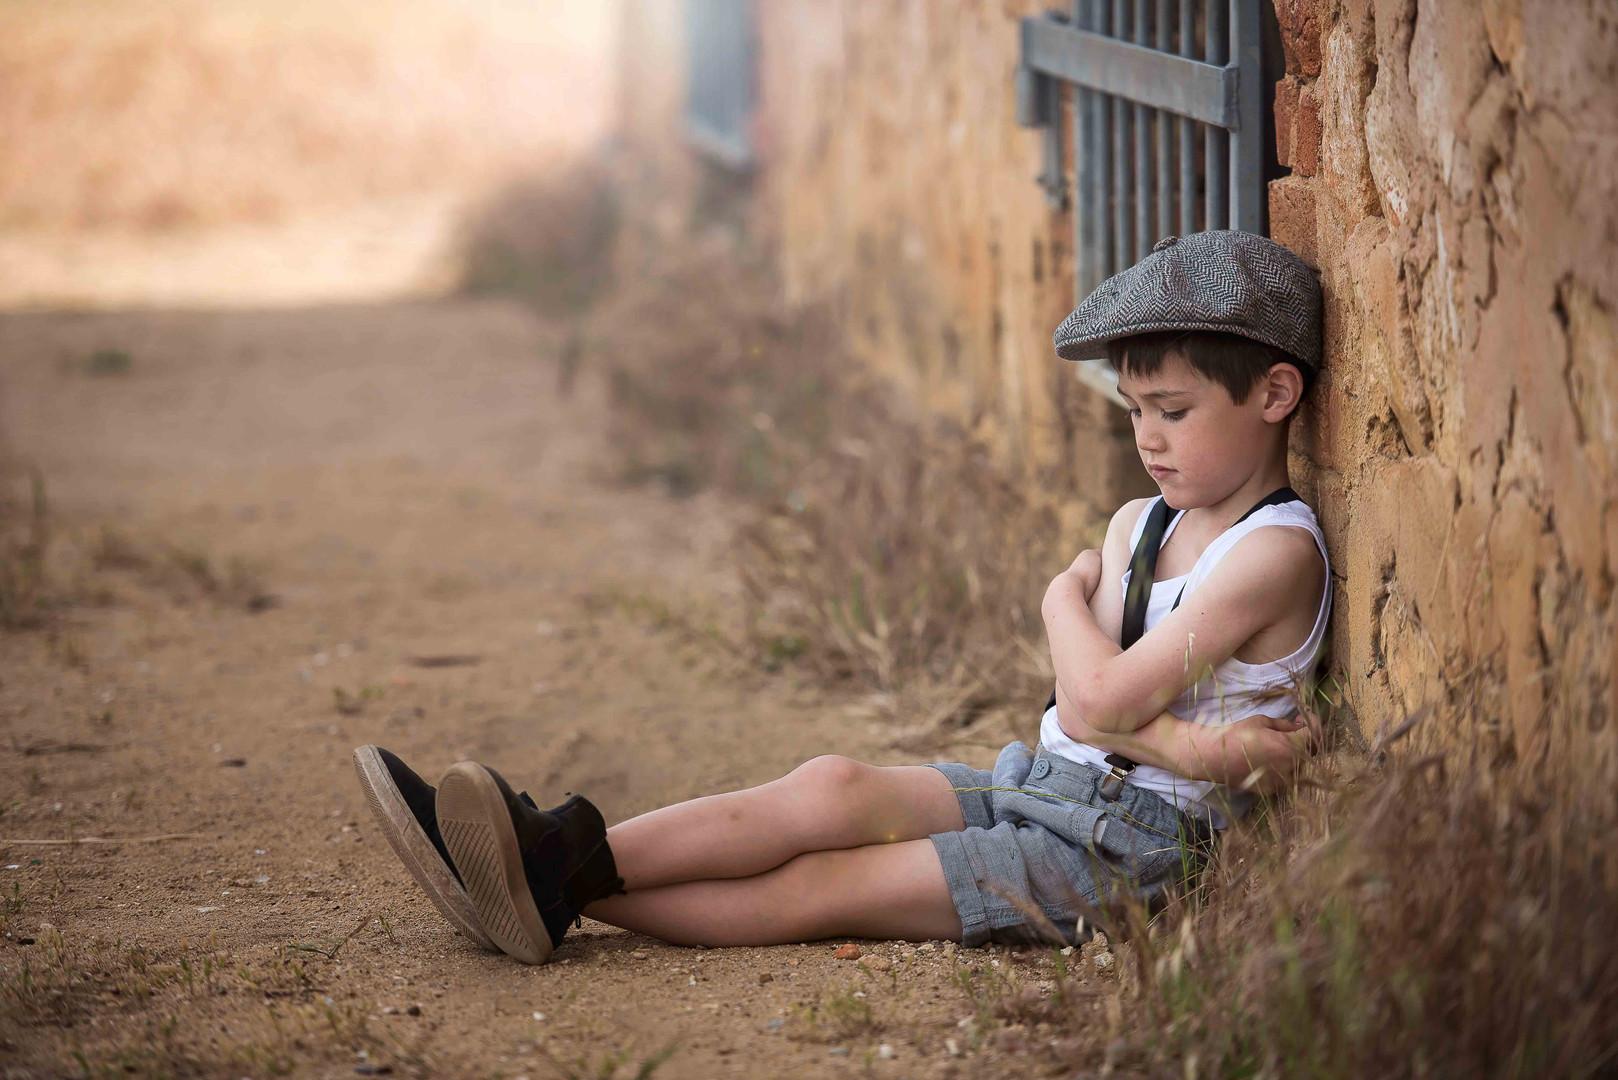 Young boy at Perrys paddock, Perth WA photo session